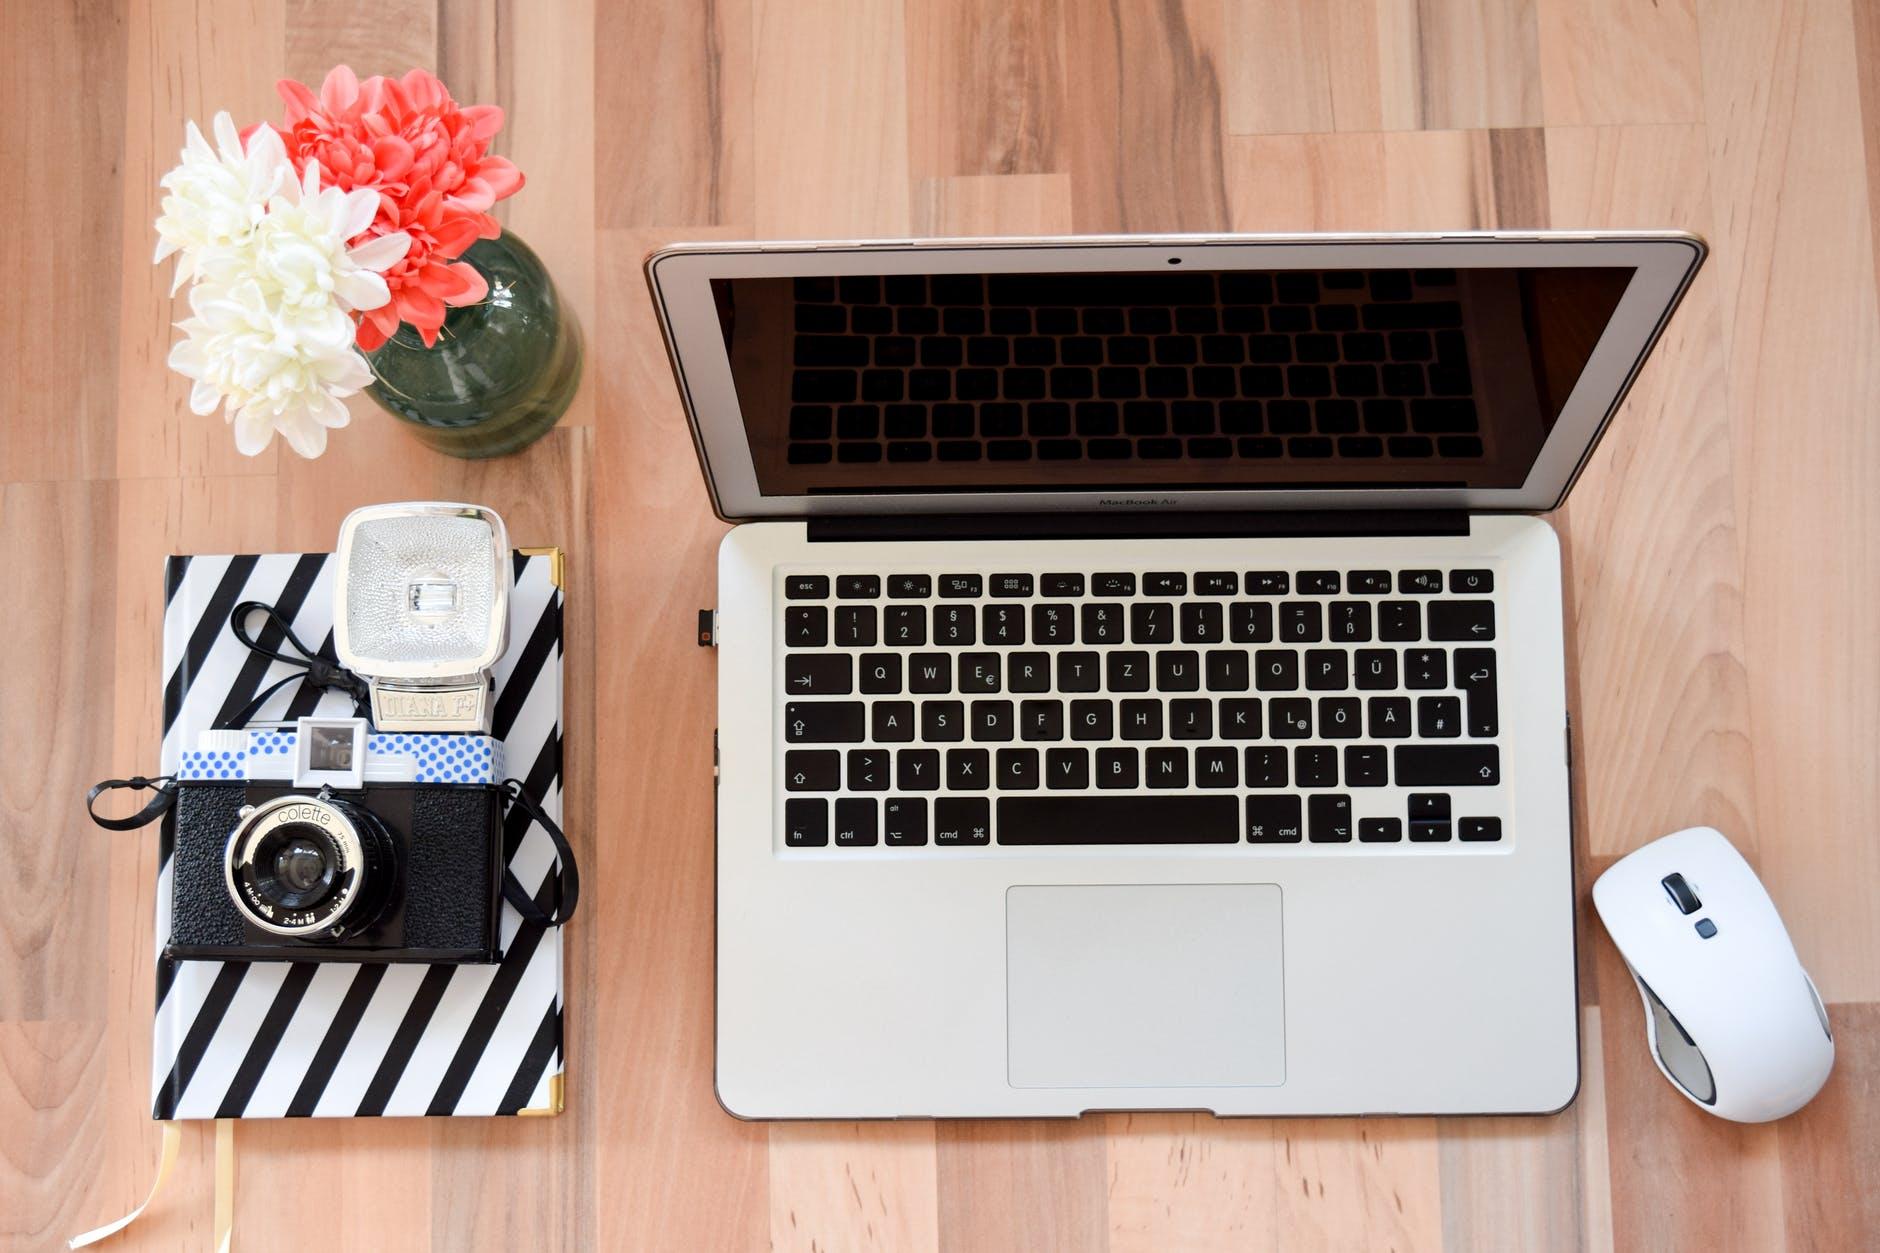 How to Choose Best Hosting for WordPress Website